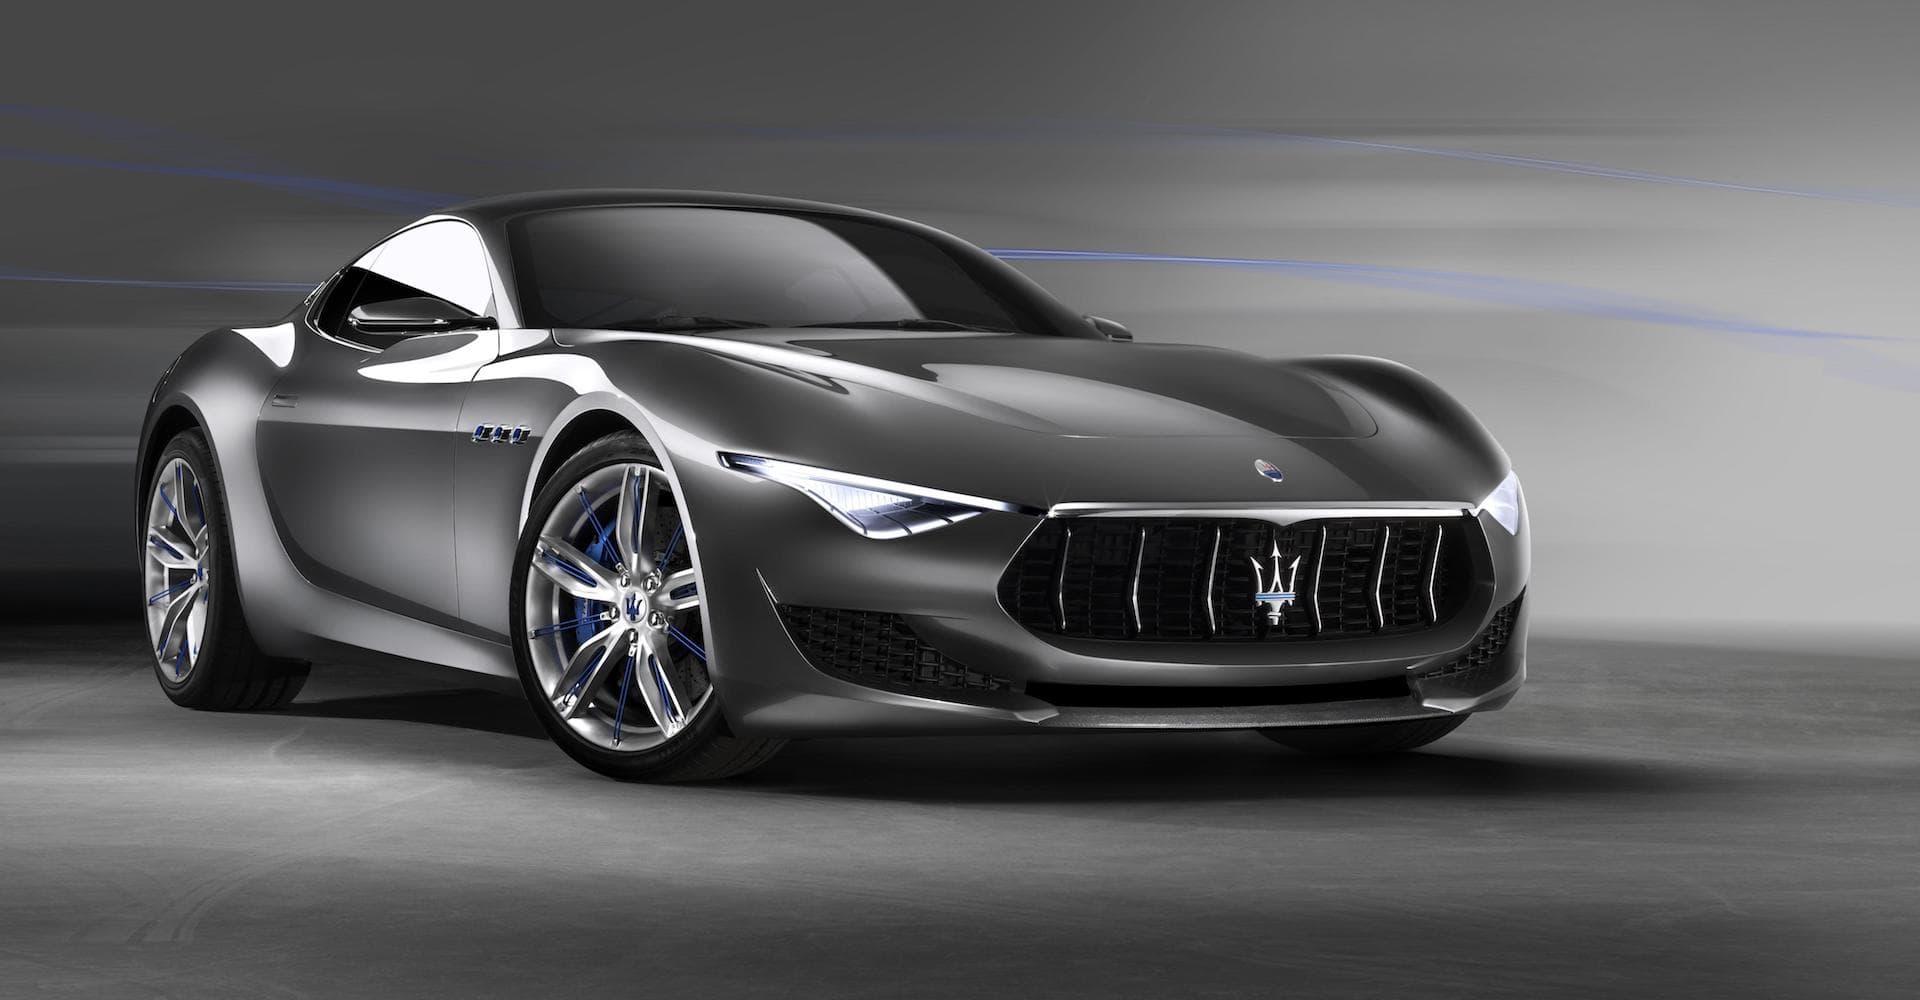 2014 Masersati Alfieri concept car   The Car Expert